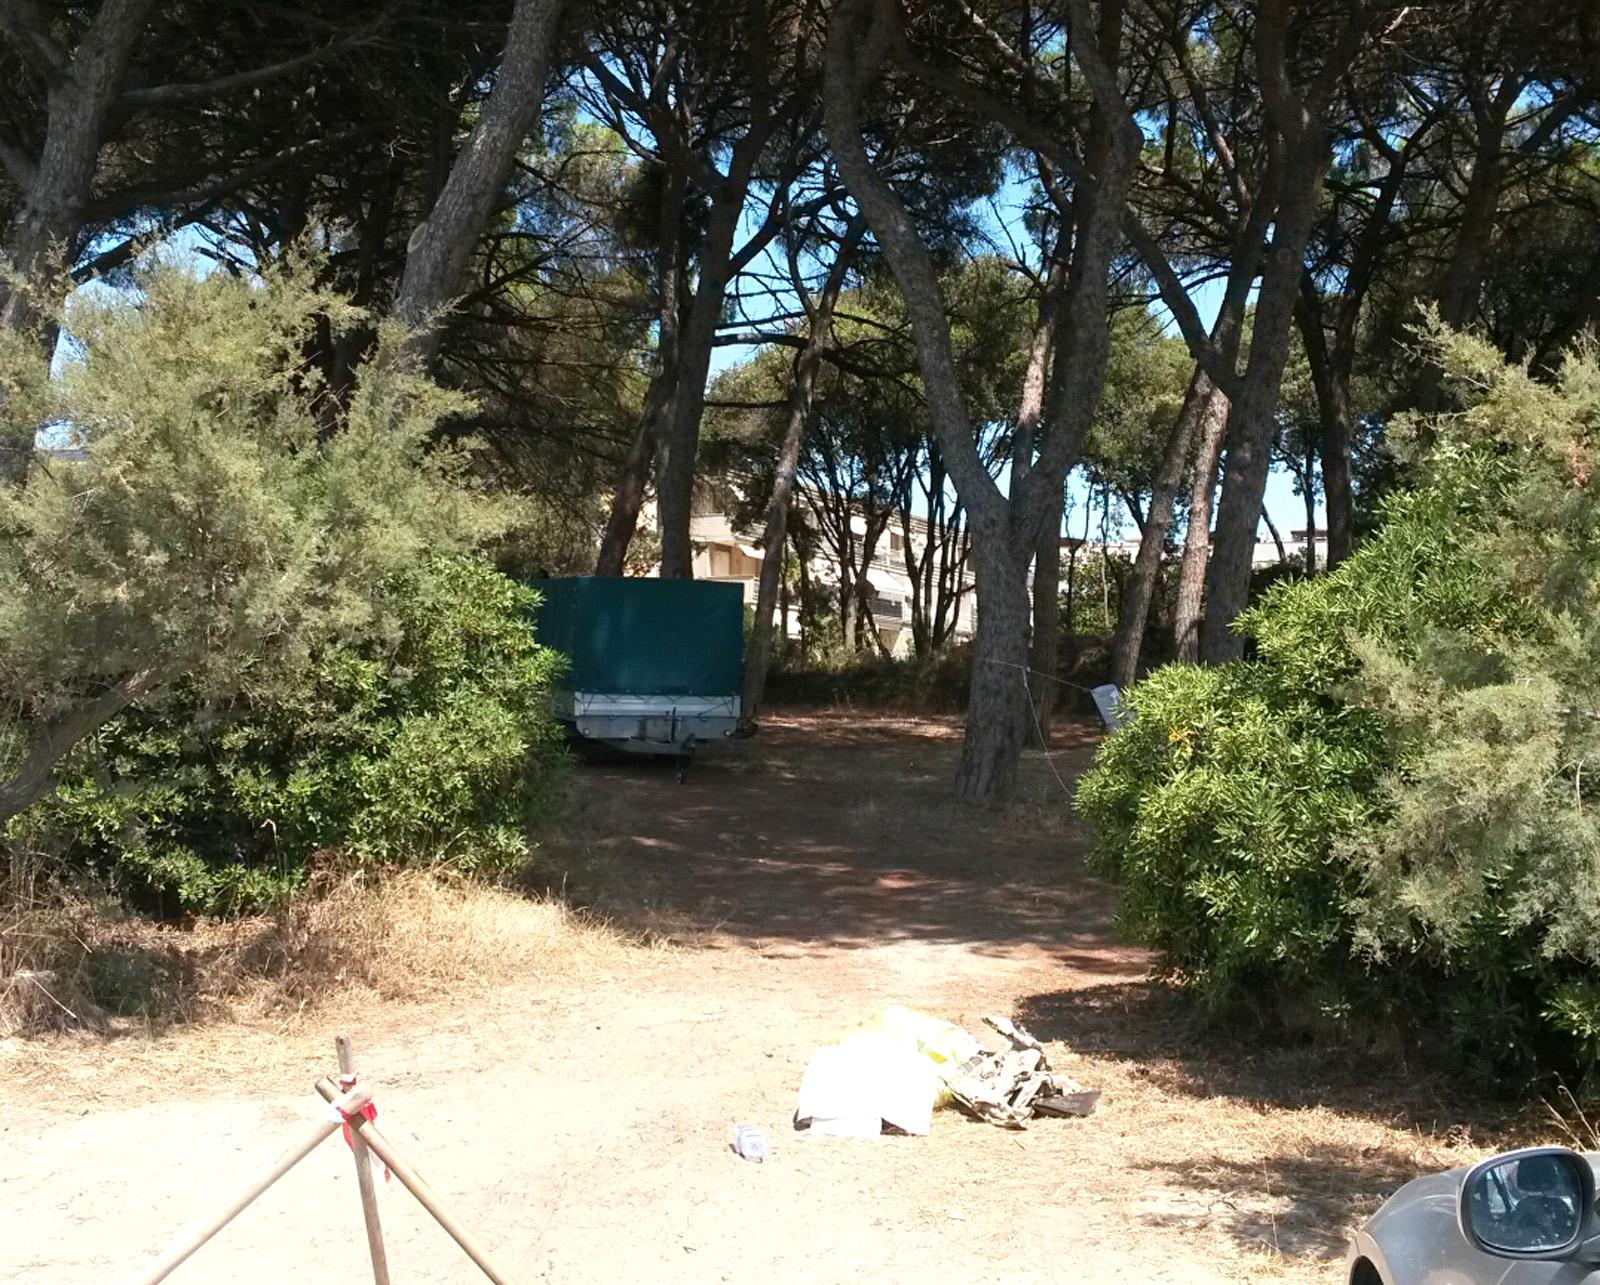 Mare e pineta. Follonica restituisce un\'area di verde a Pratoranieri ...